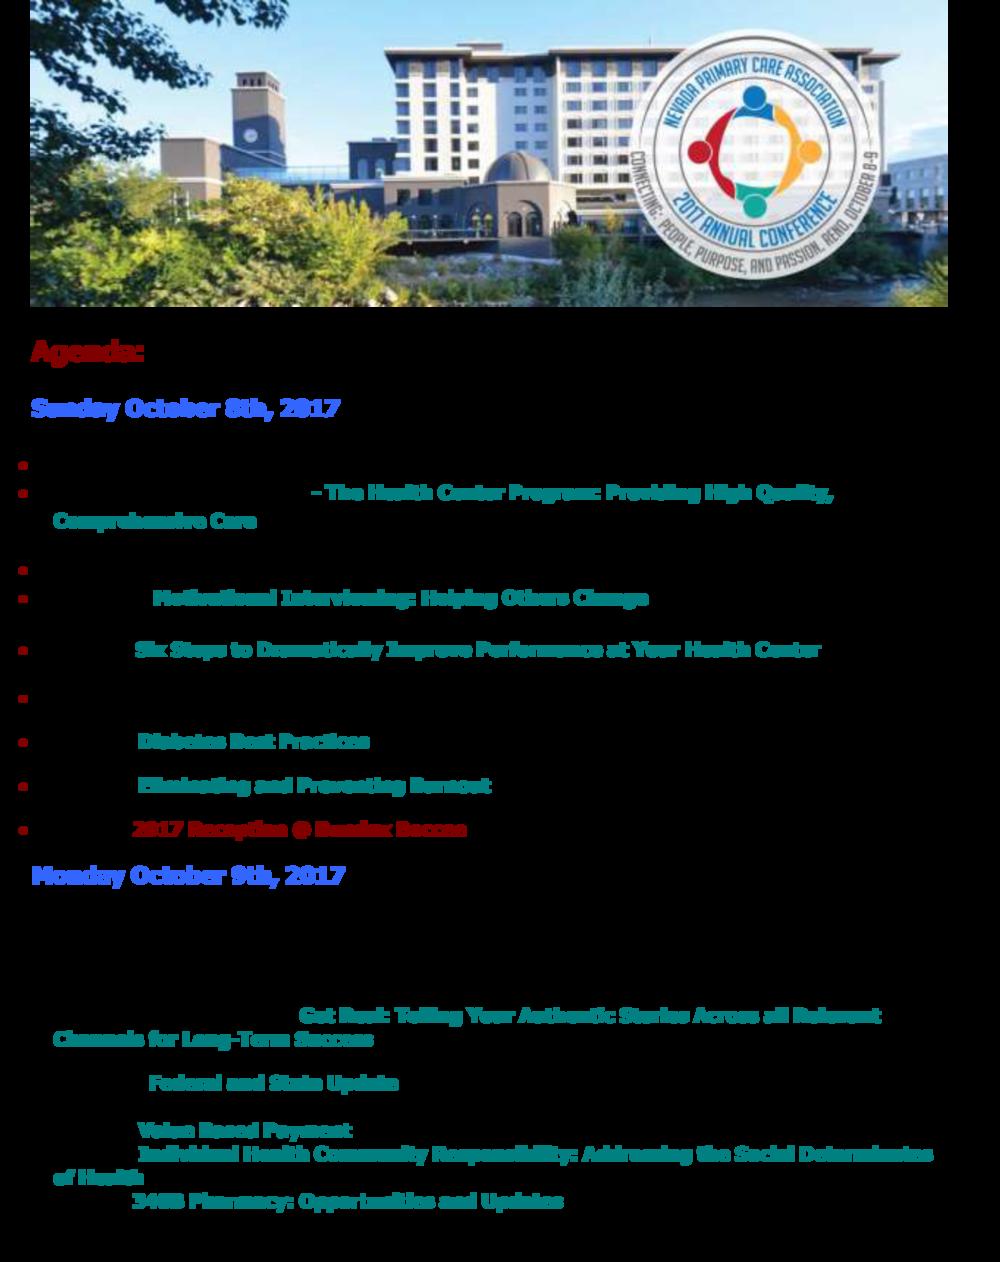 2017AC-Agenda.png